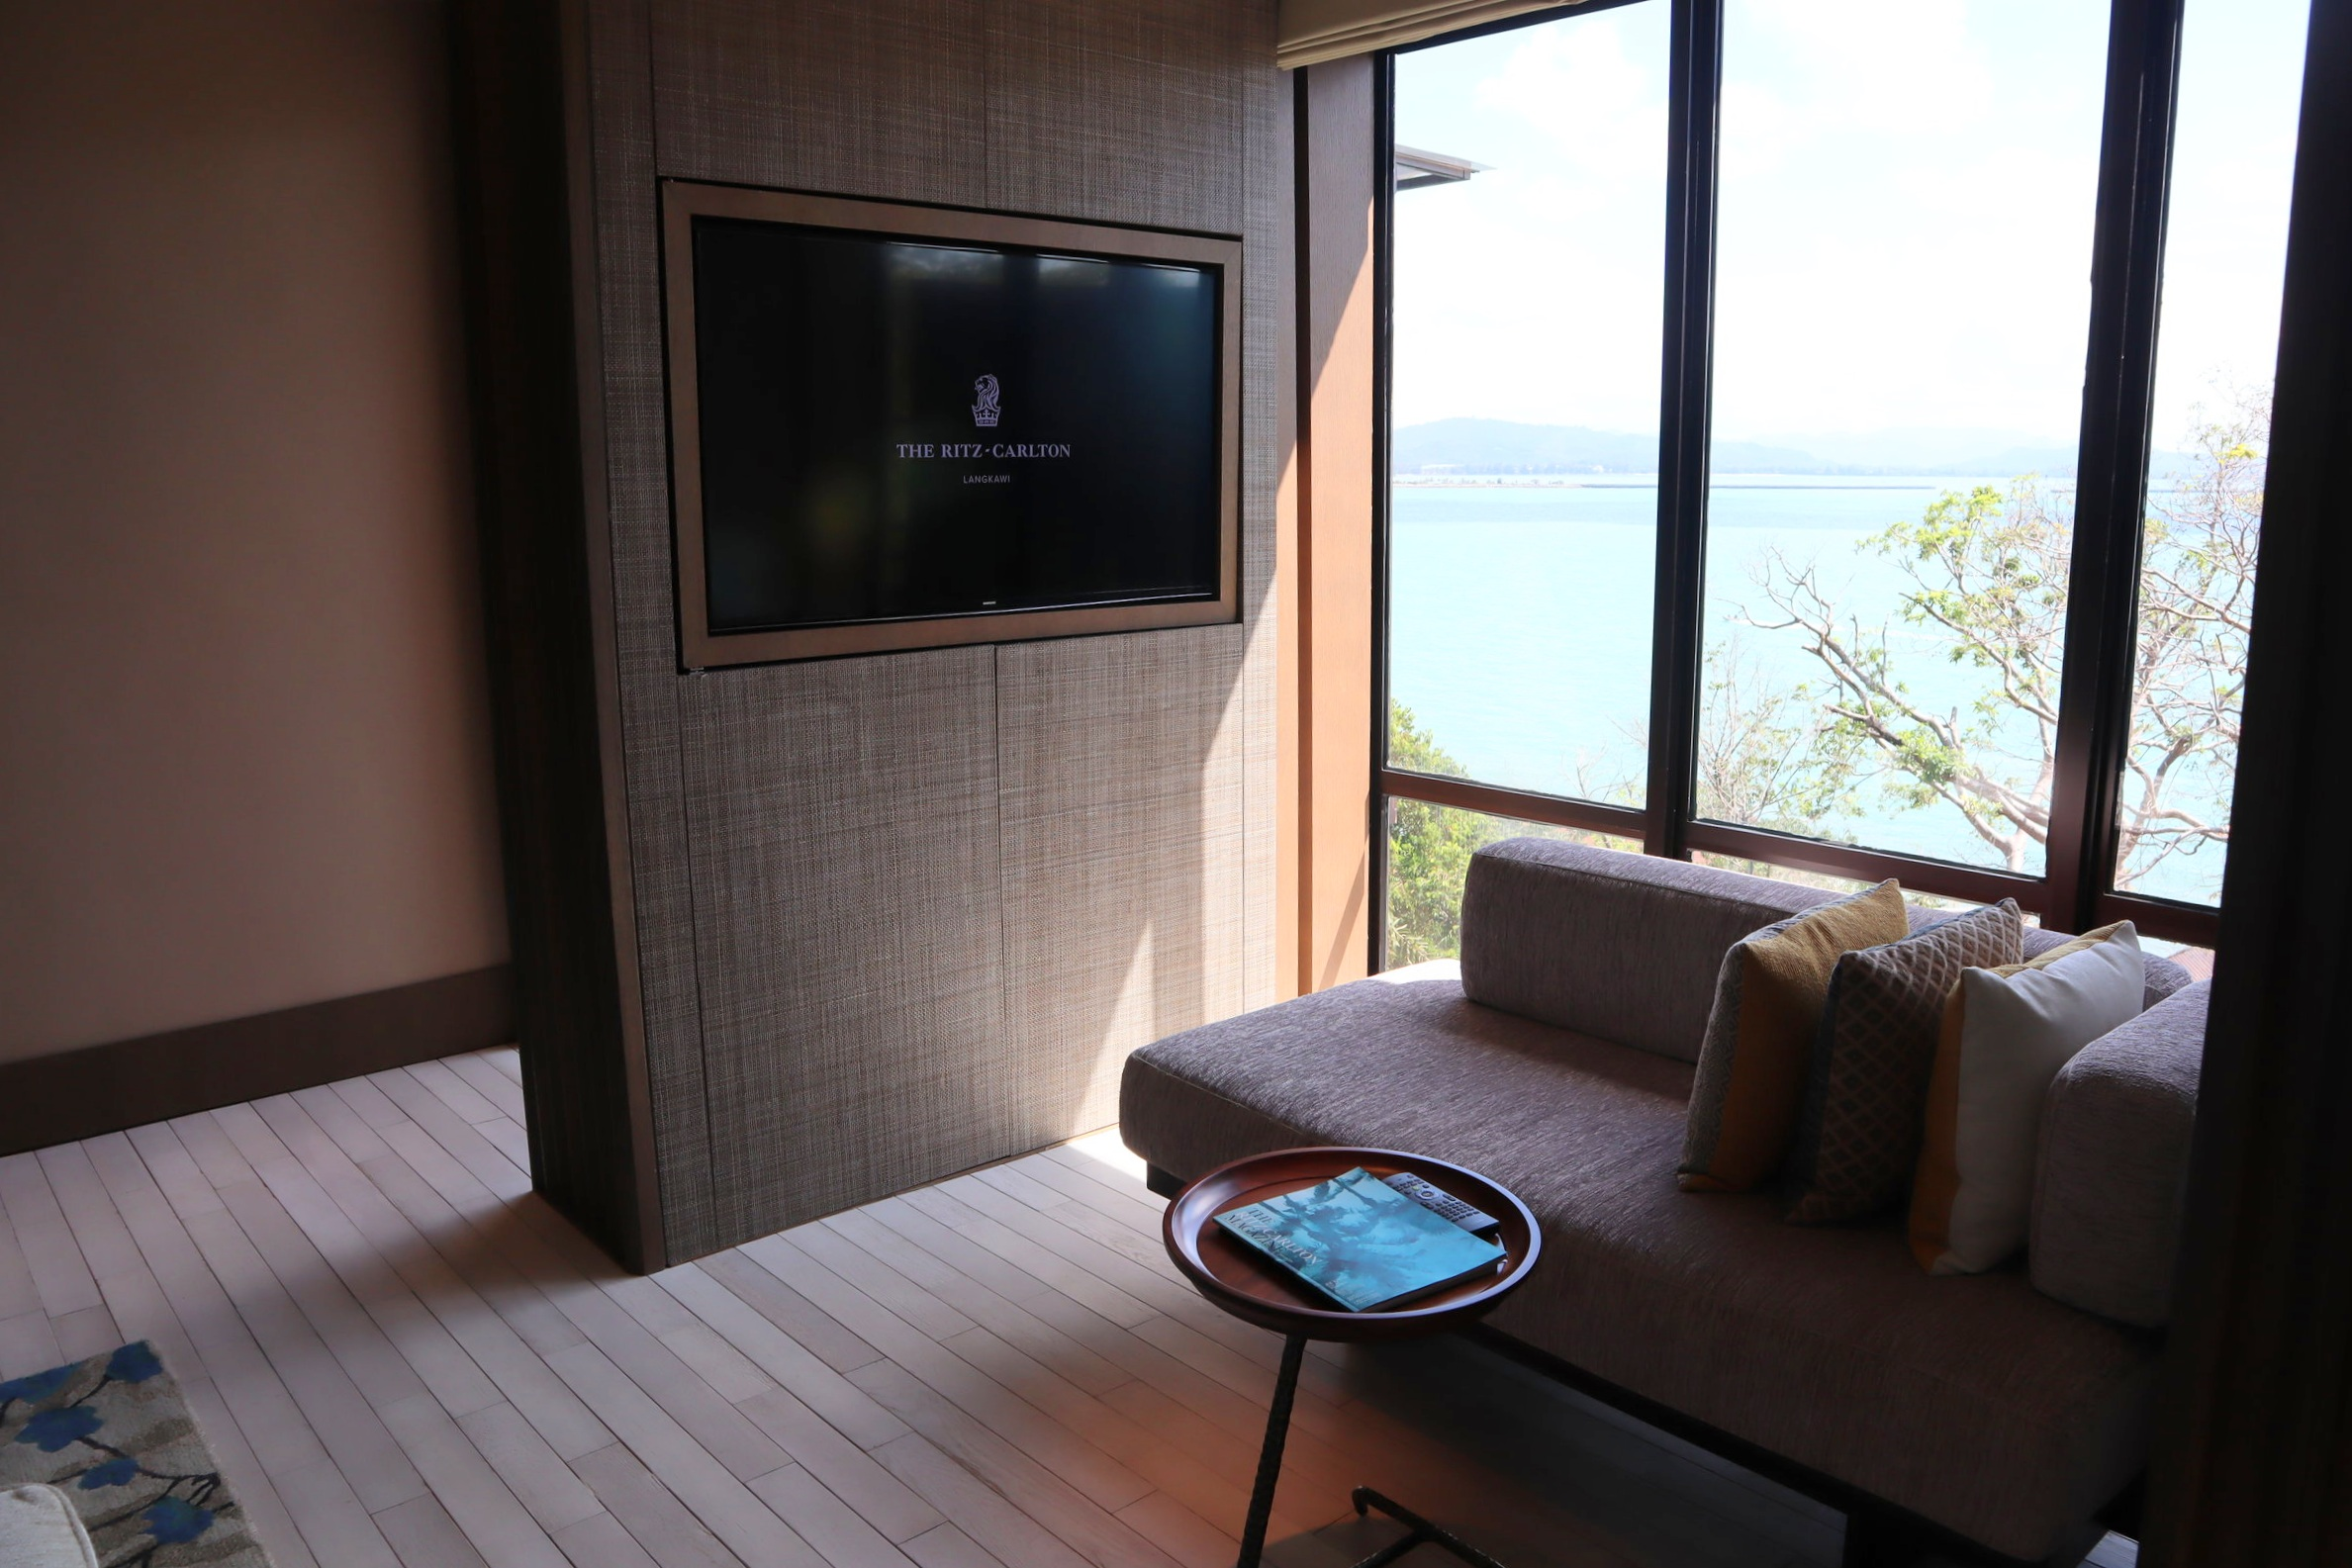 The Ritz-Carlton, Langkawi – Rainforest Junior Suite television